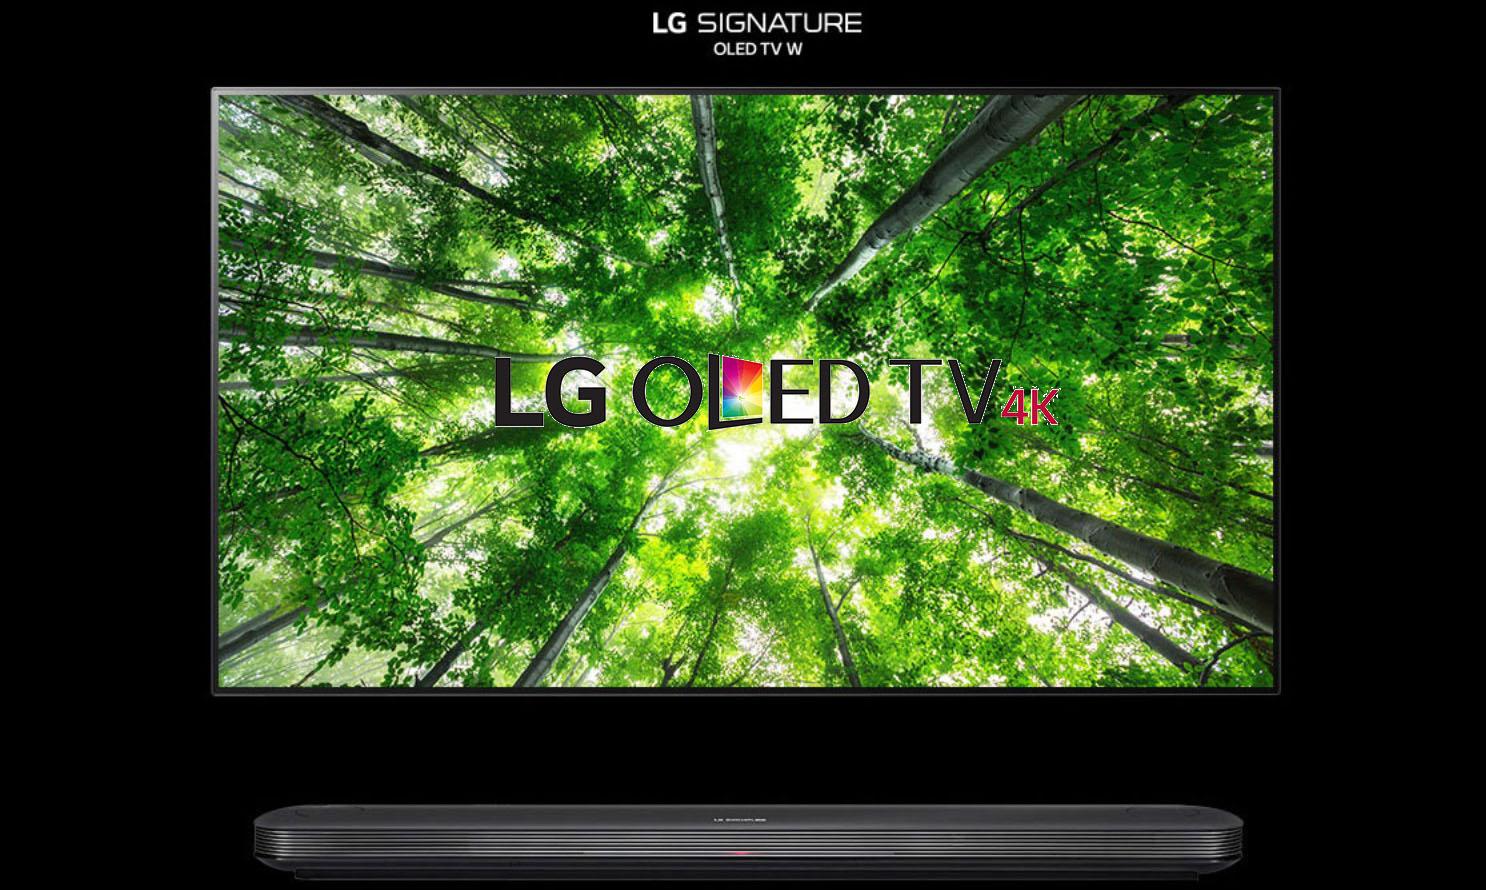 Buy LG TVs San Diego La Jolla